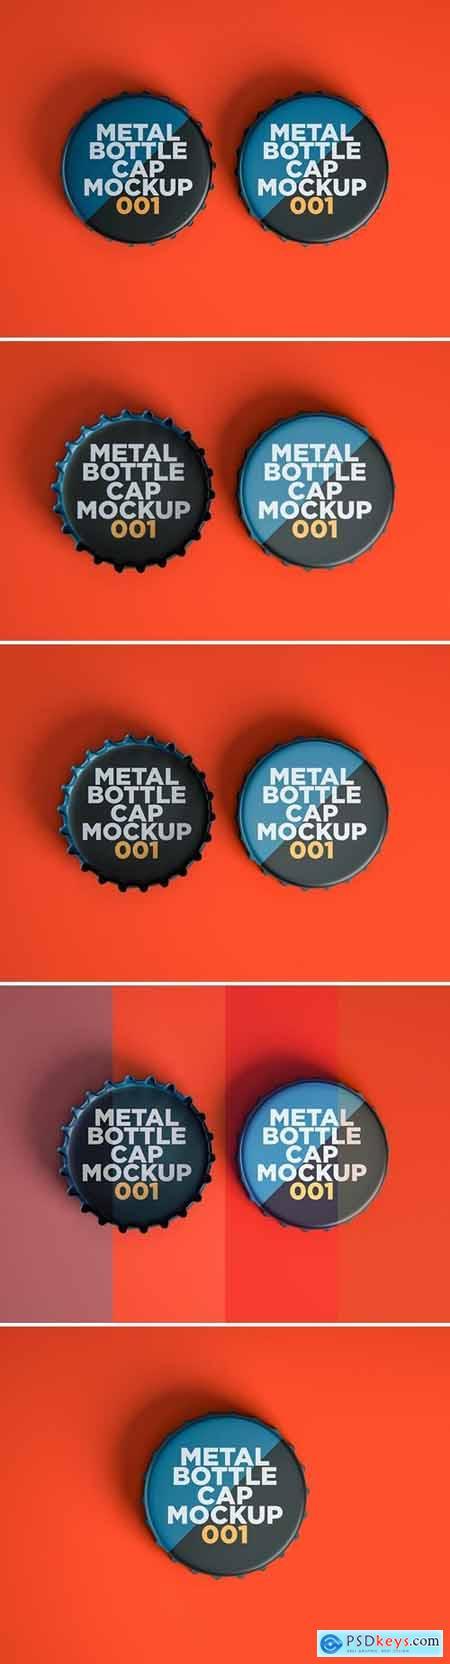 Metal Bottle Cap Mockup 001